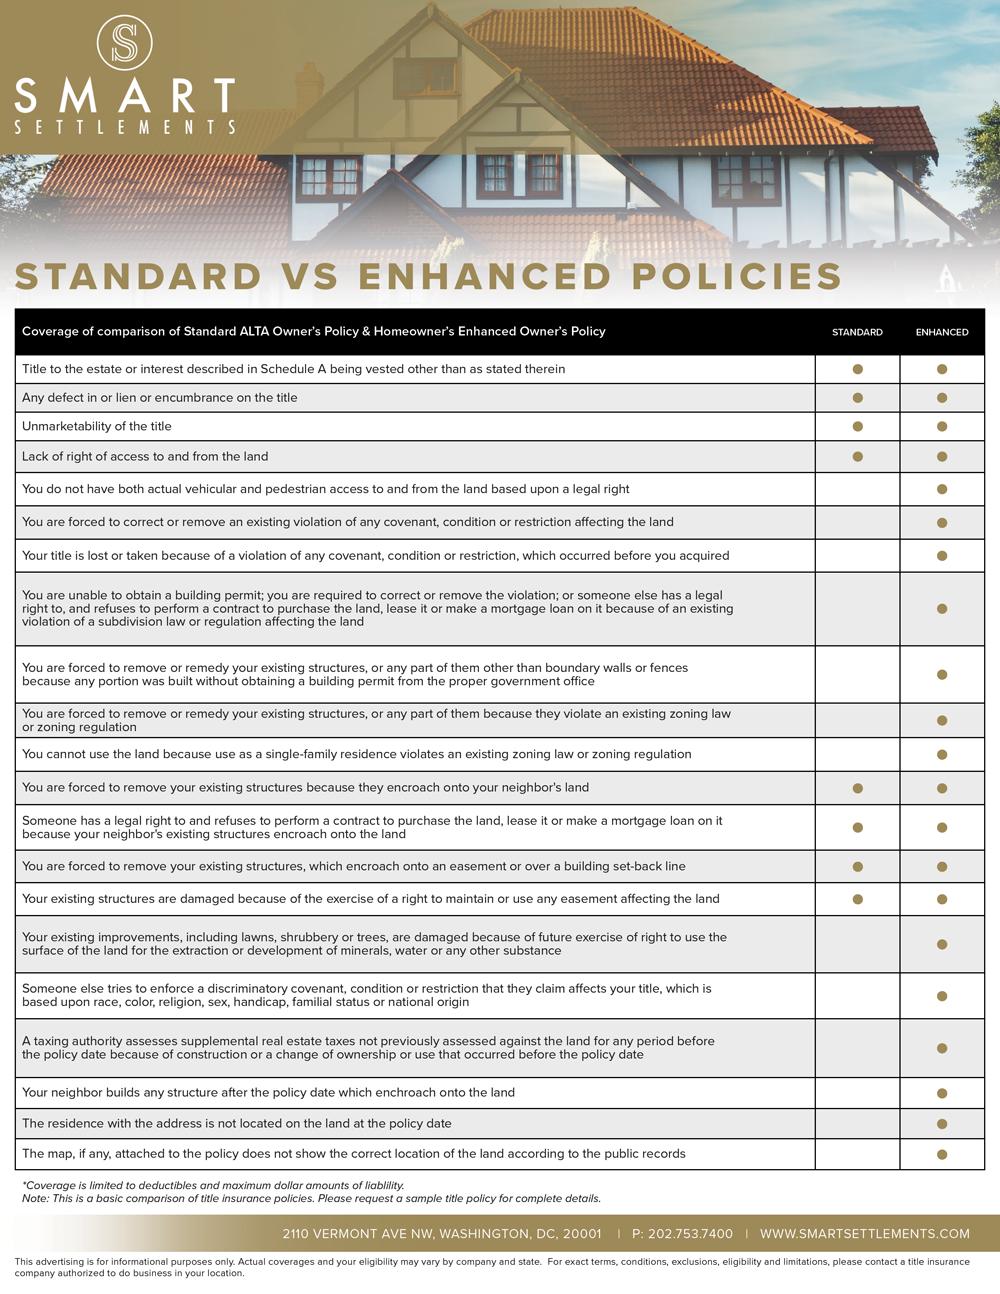 smart-settlements.standard-vs-enhanced.png